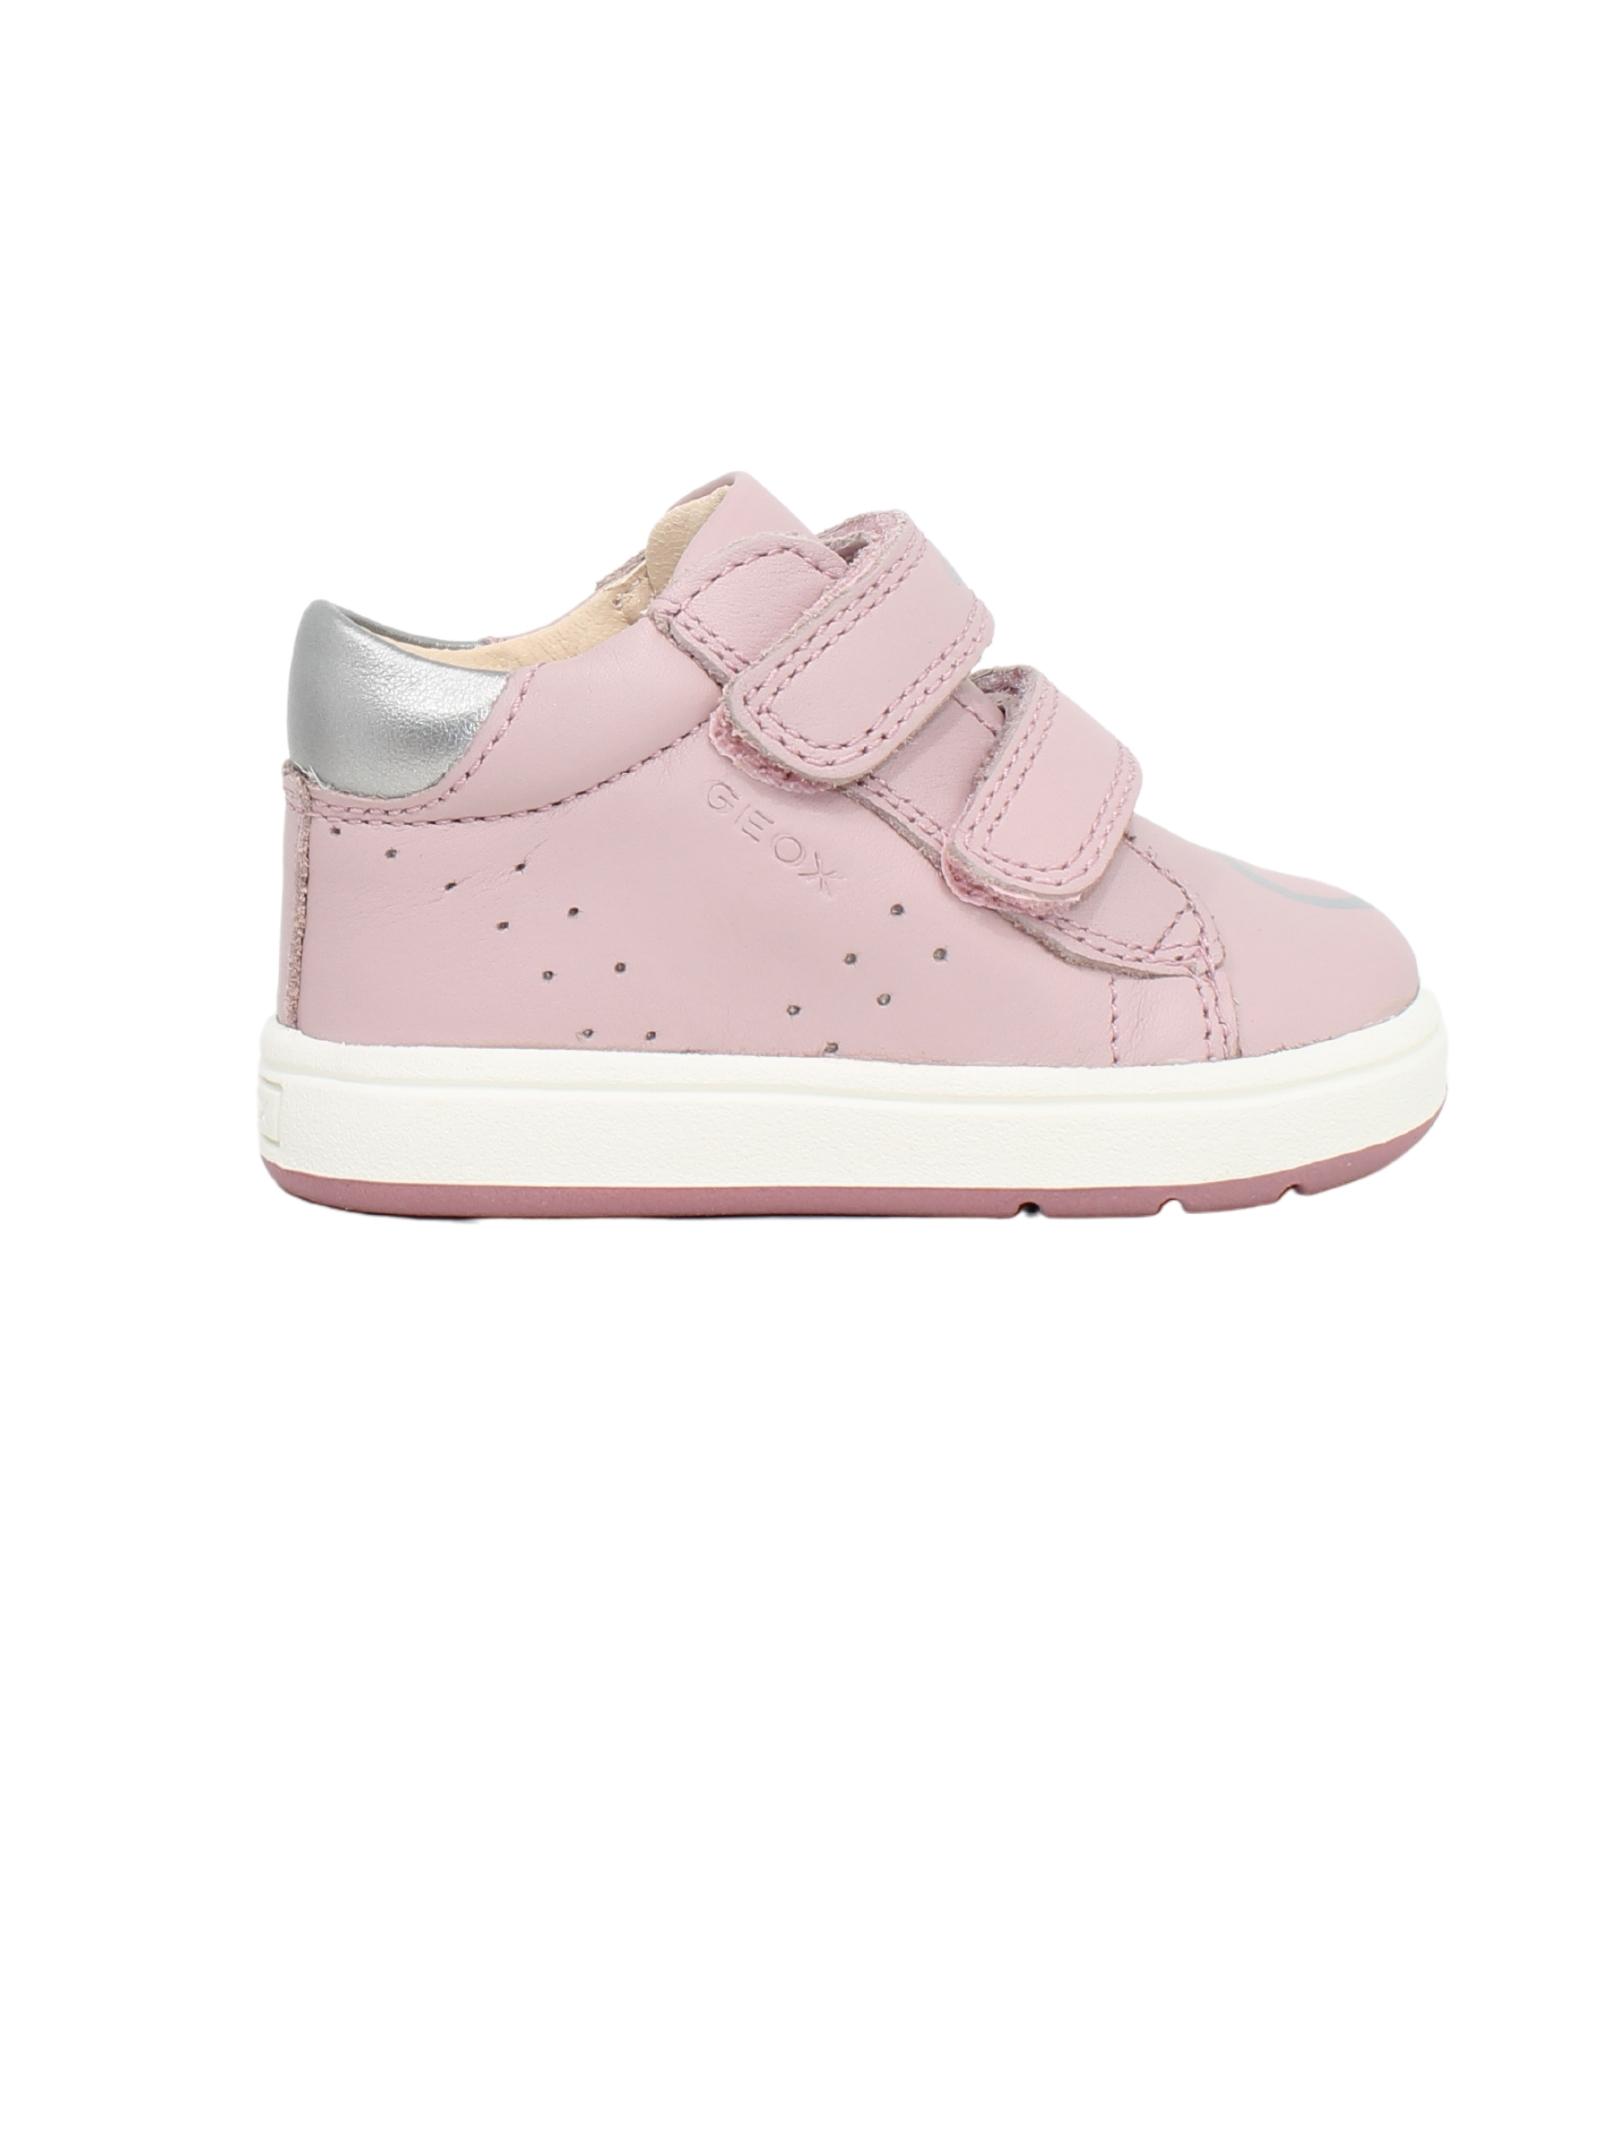 Sneakers Stampa Fiore Bambina GEOX KIDS | Sneakers | B044CC00085C8011